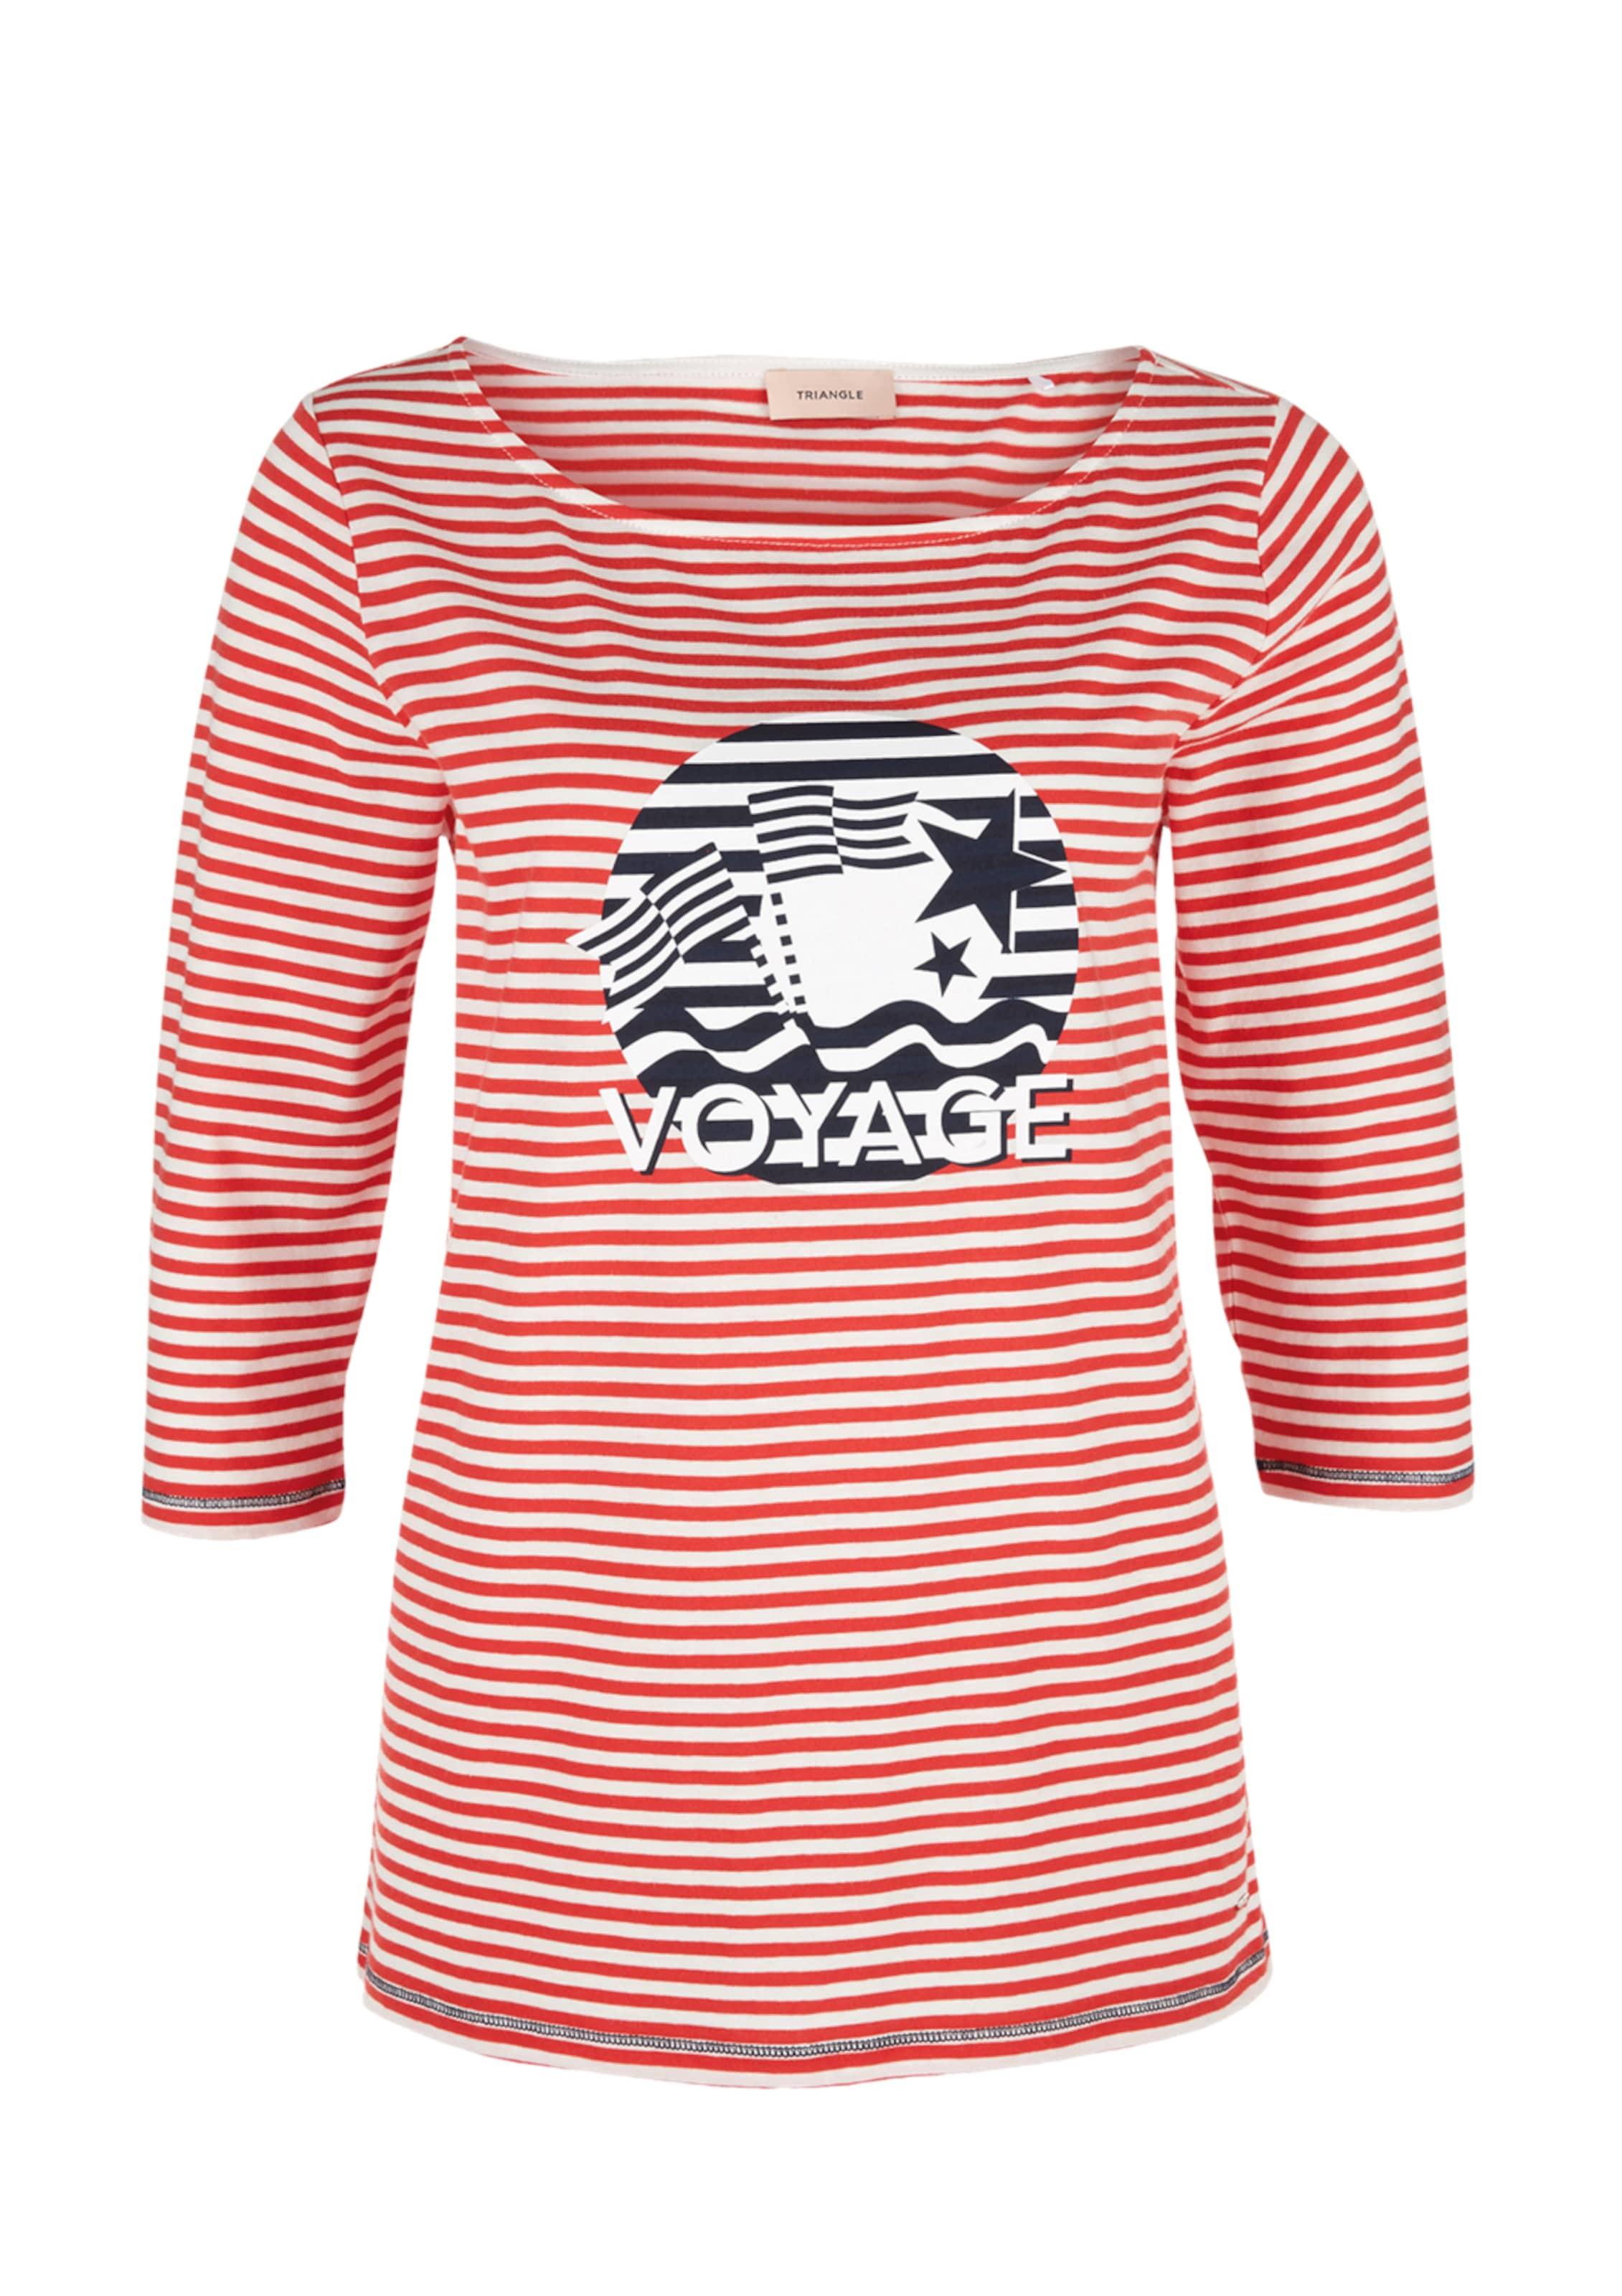 Shirt RotSchwarz Triangle In Triangle Triangle Shirt Weiß RotSchwarz In Shirt In Weiß NnX8ZOP0wk